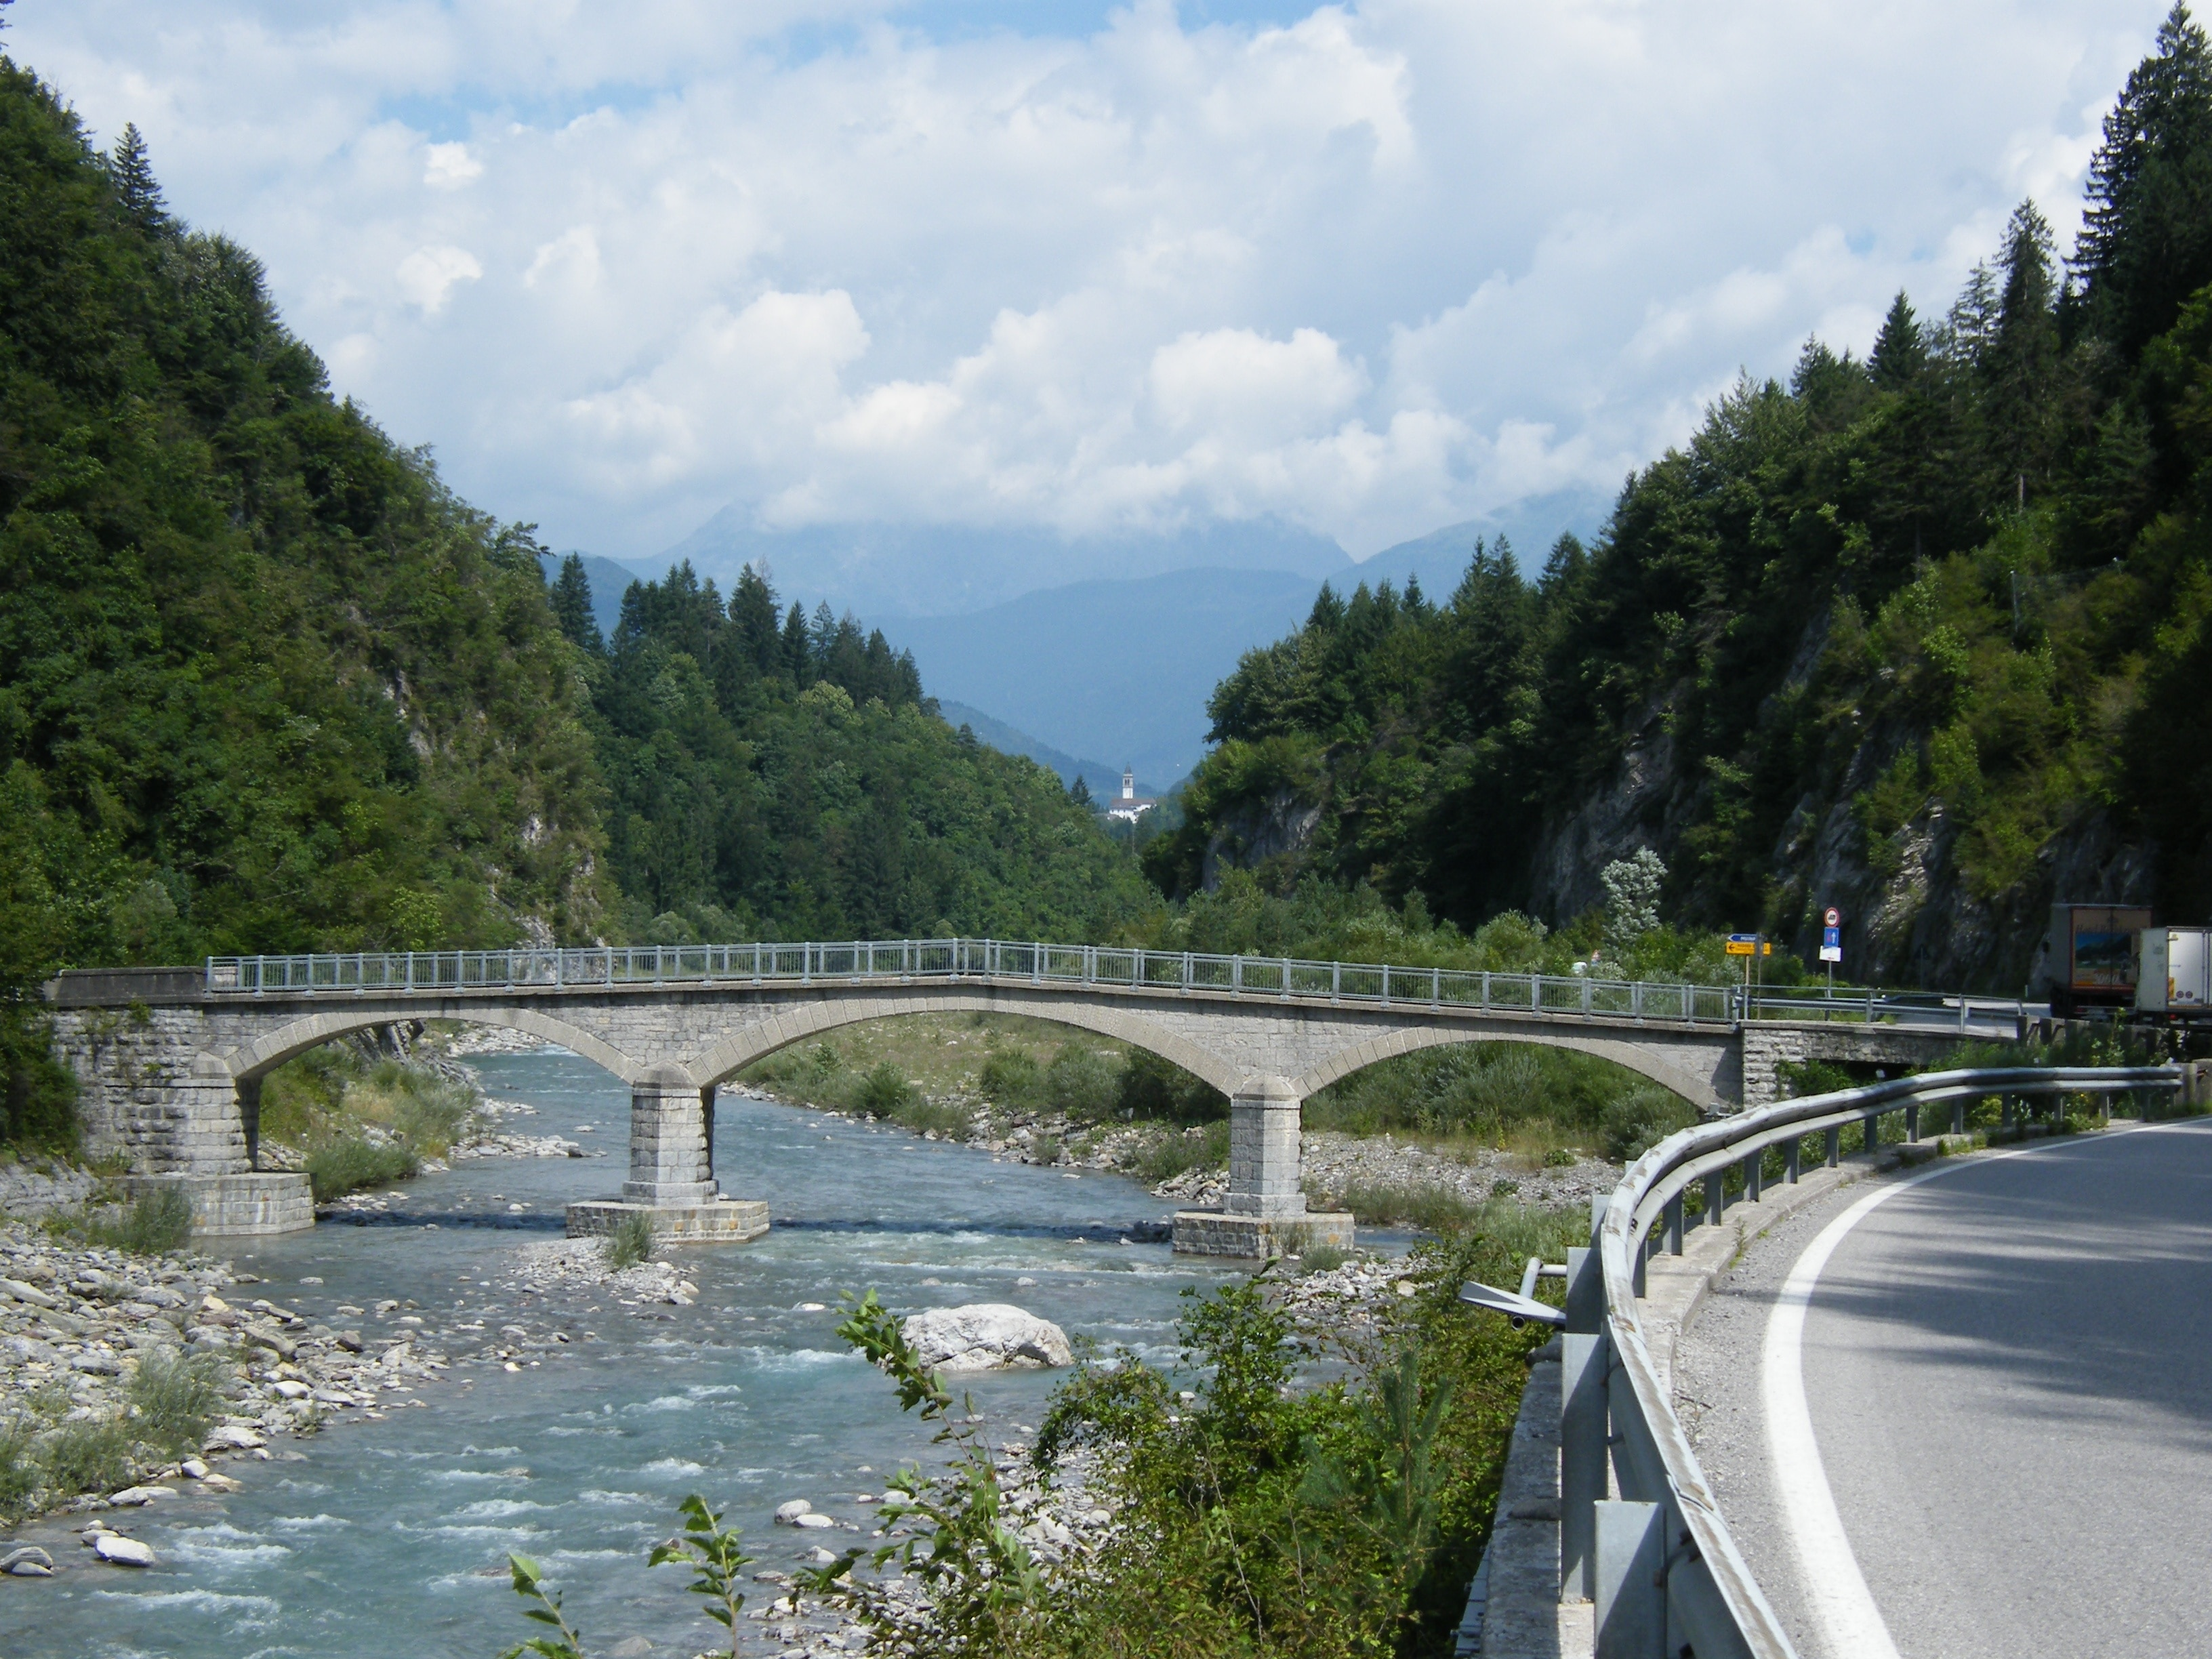 Ovaro, Friuli Venezia Giulia, Italy